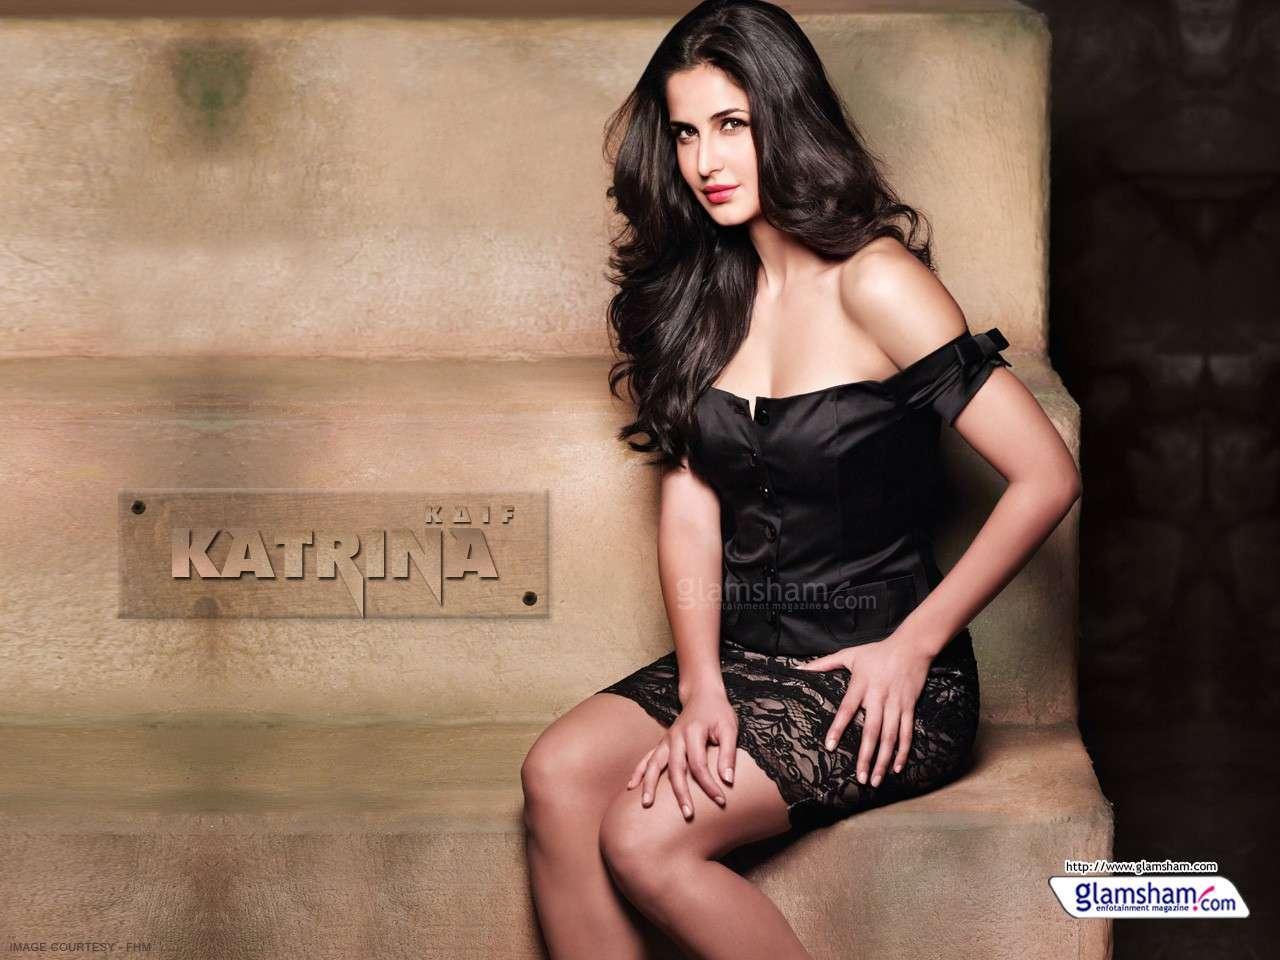 Katrina kaif duplicate fucked by indian men during image shoot